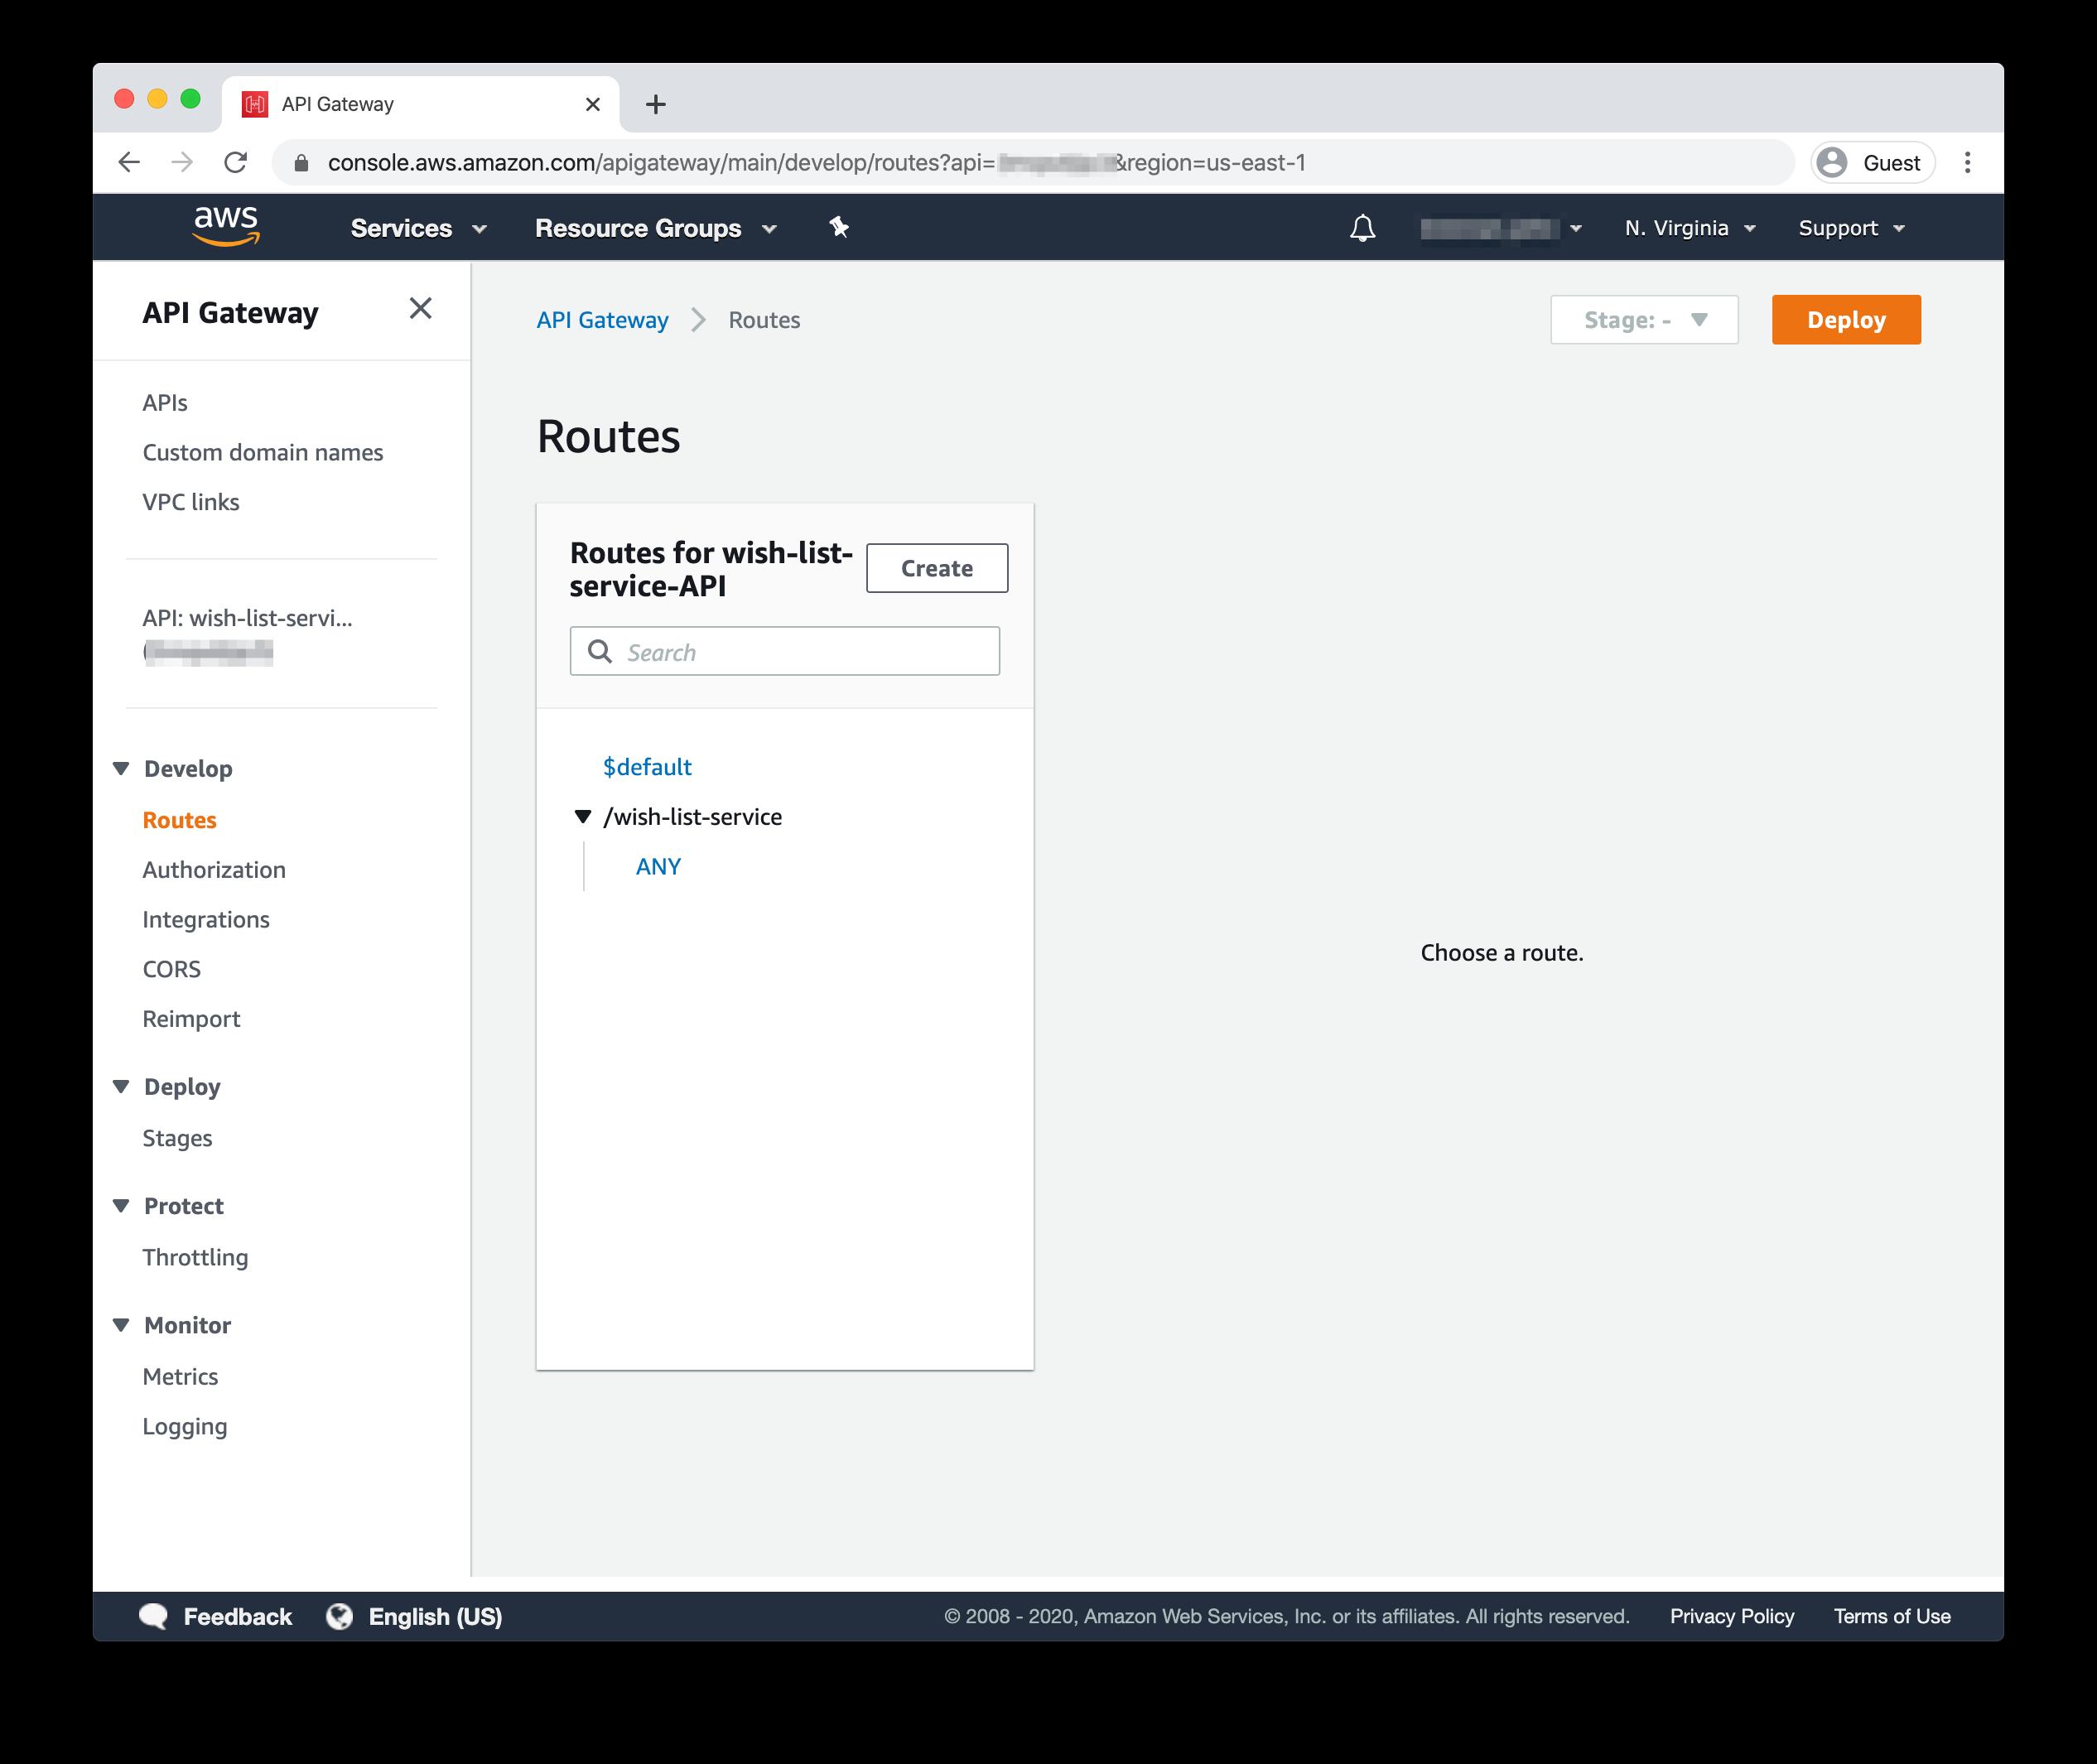 API Gateway Routes dashboard